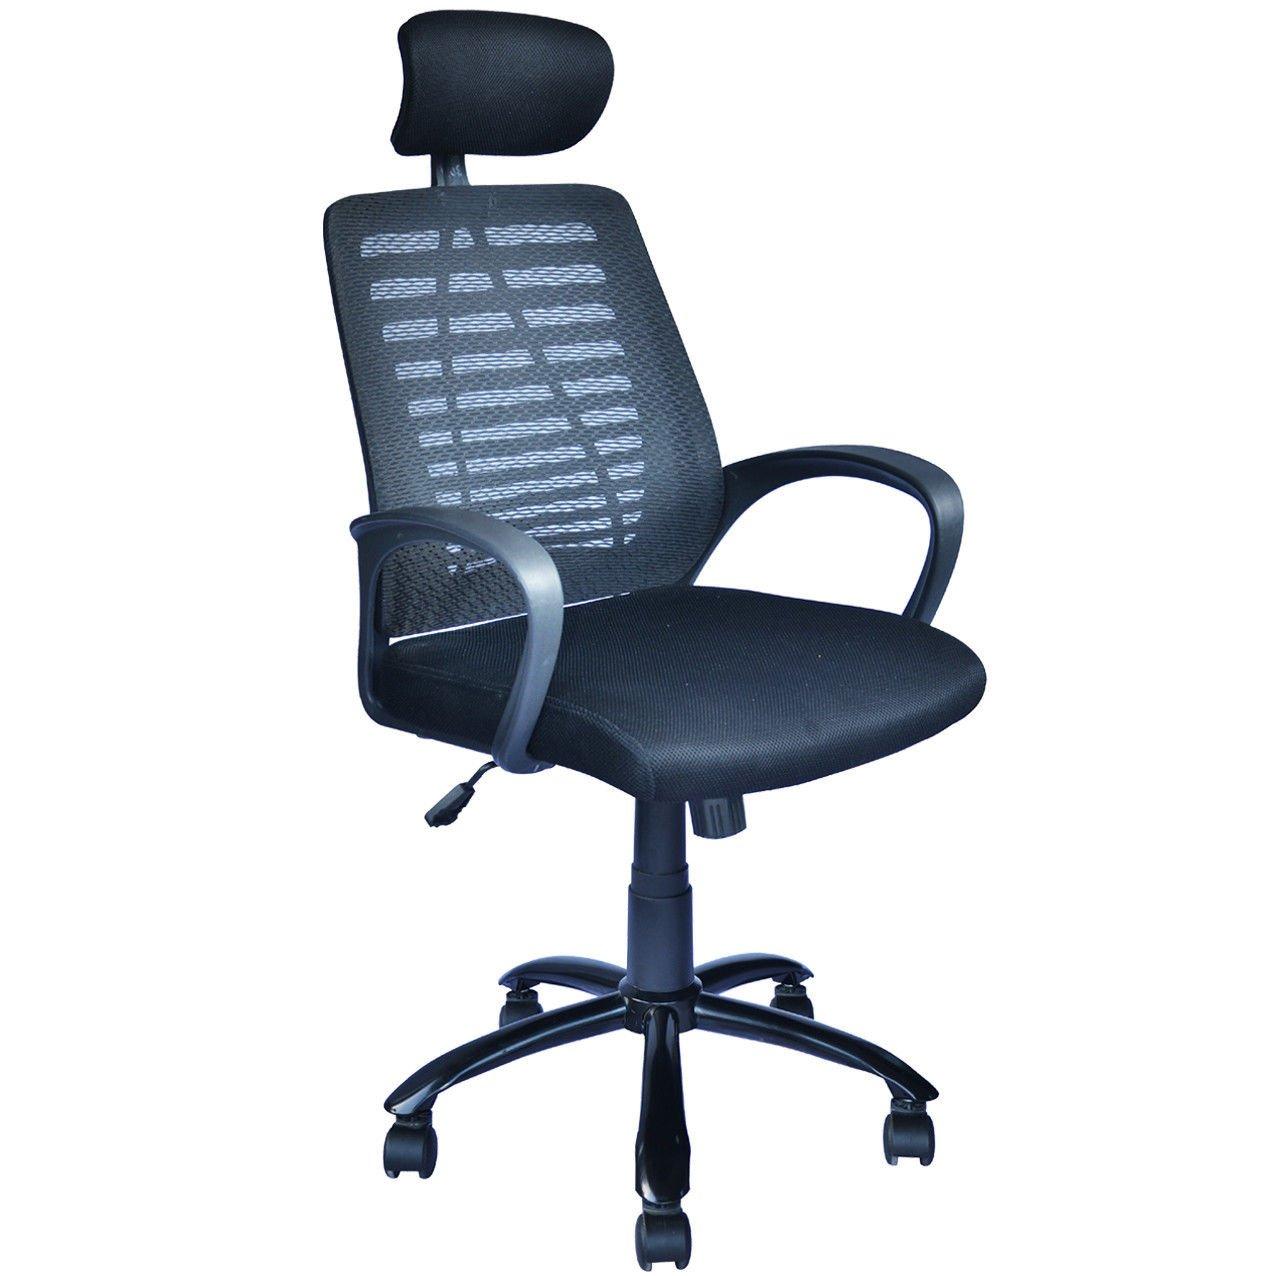 ergonomic mesh office chair uk pretty bedroom chairs back task computer w